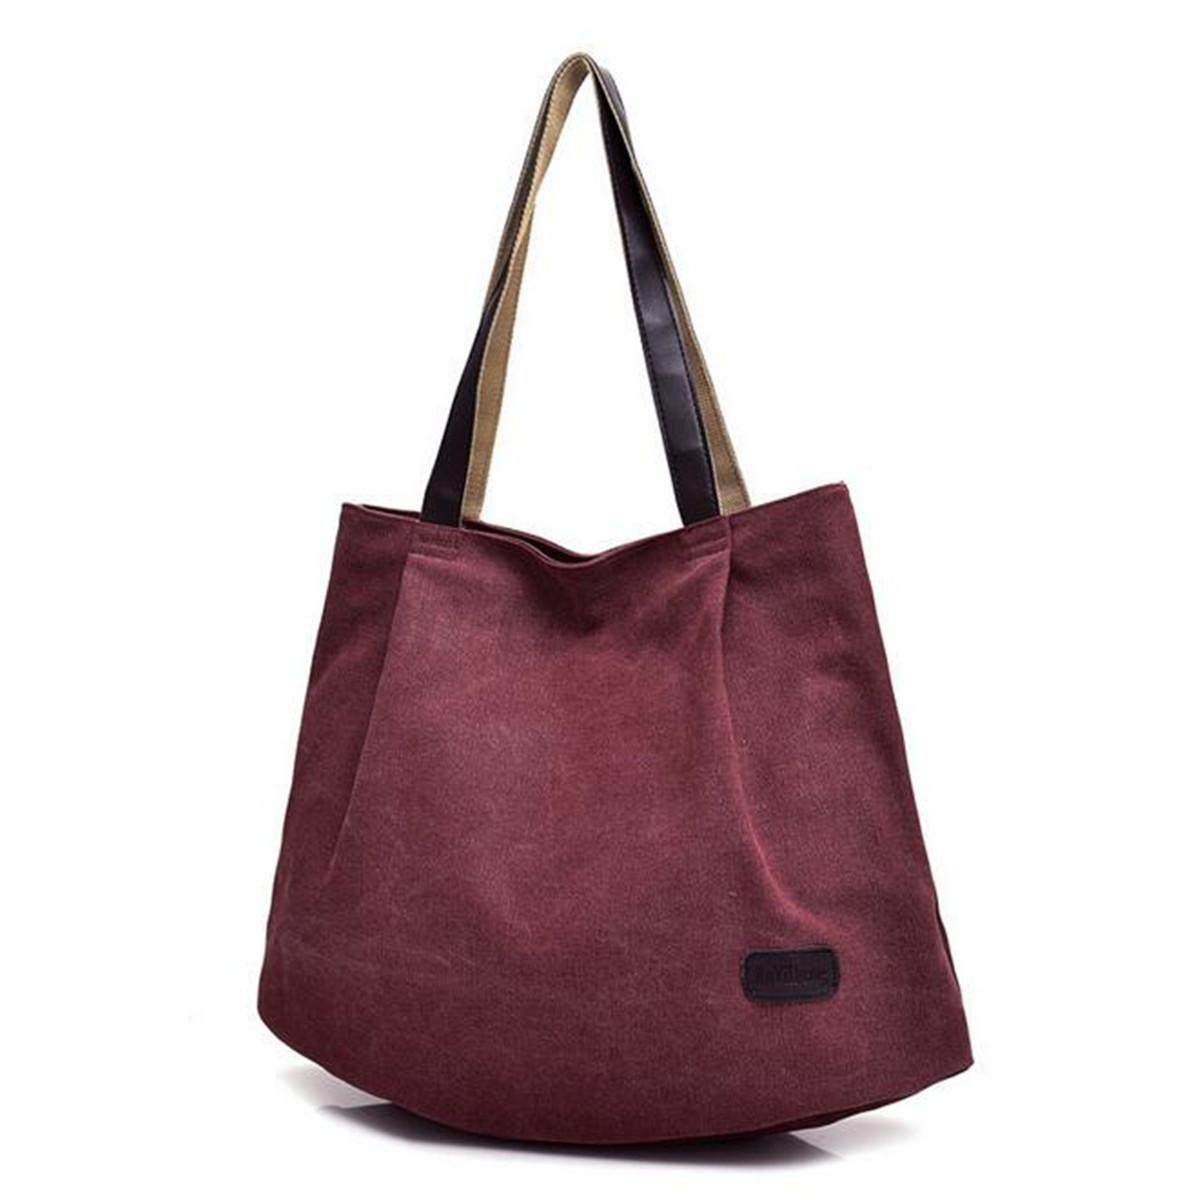 Women Canvas Handbag Shoulder Bag CrossBody Bags Tote Messenger Satchel Large